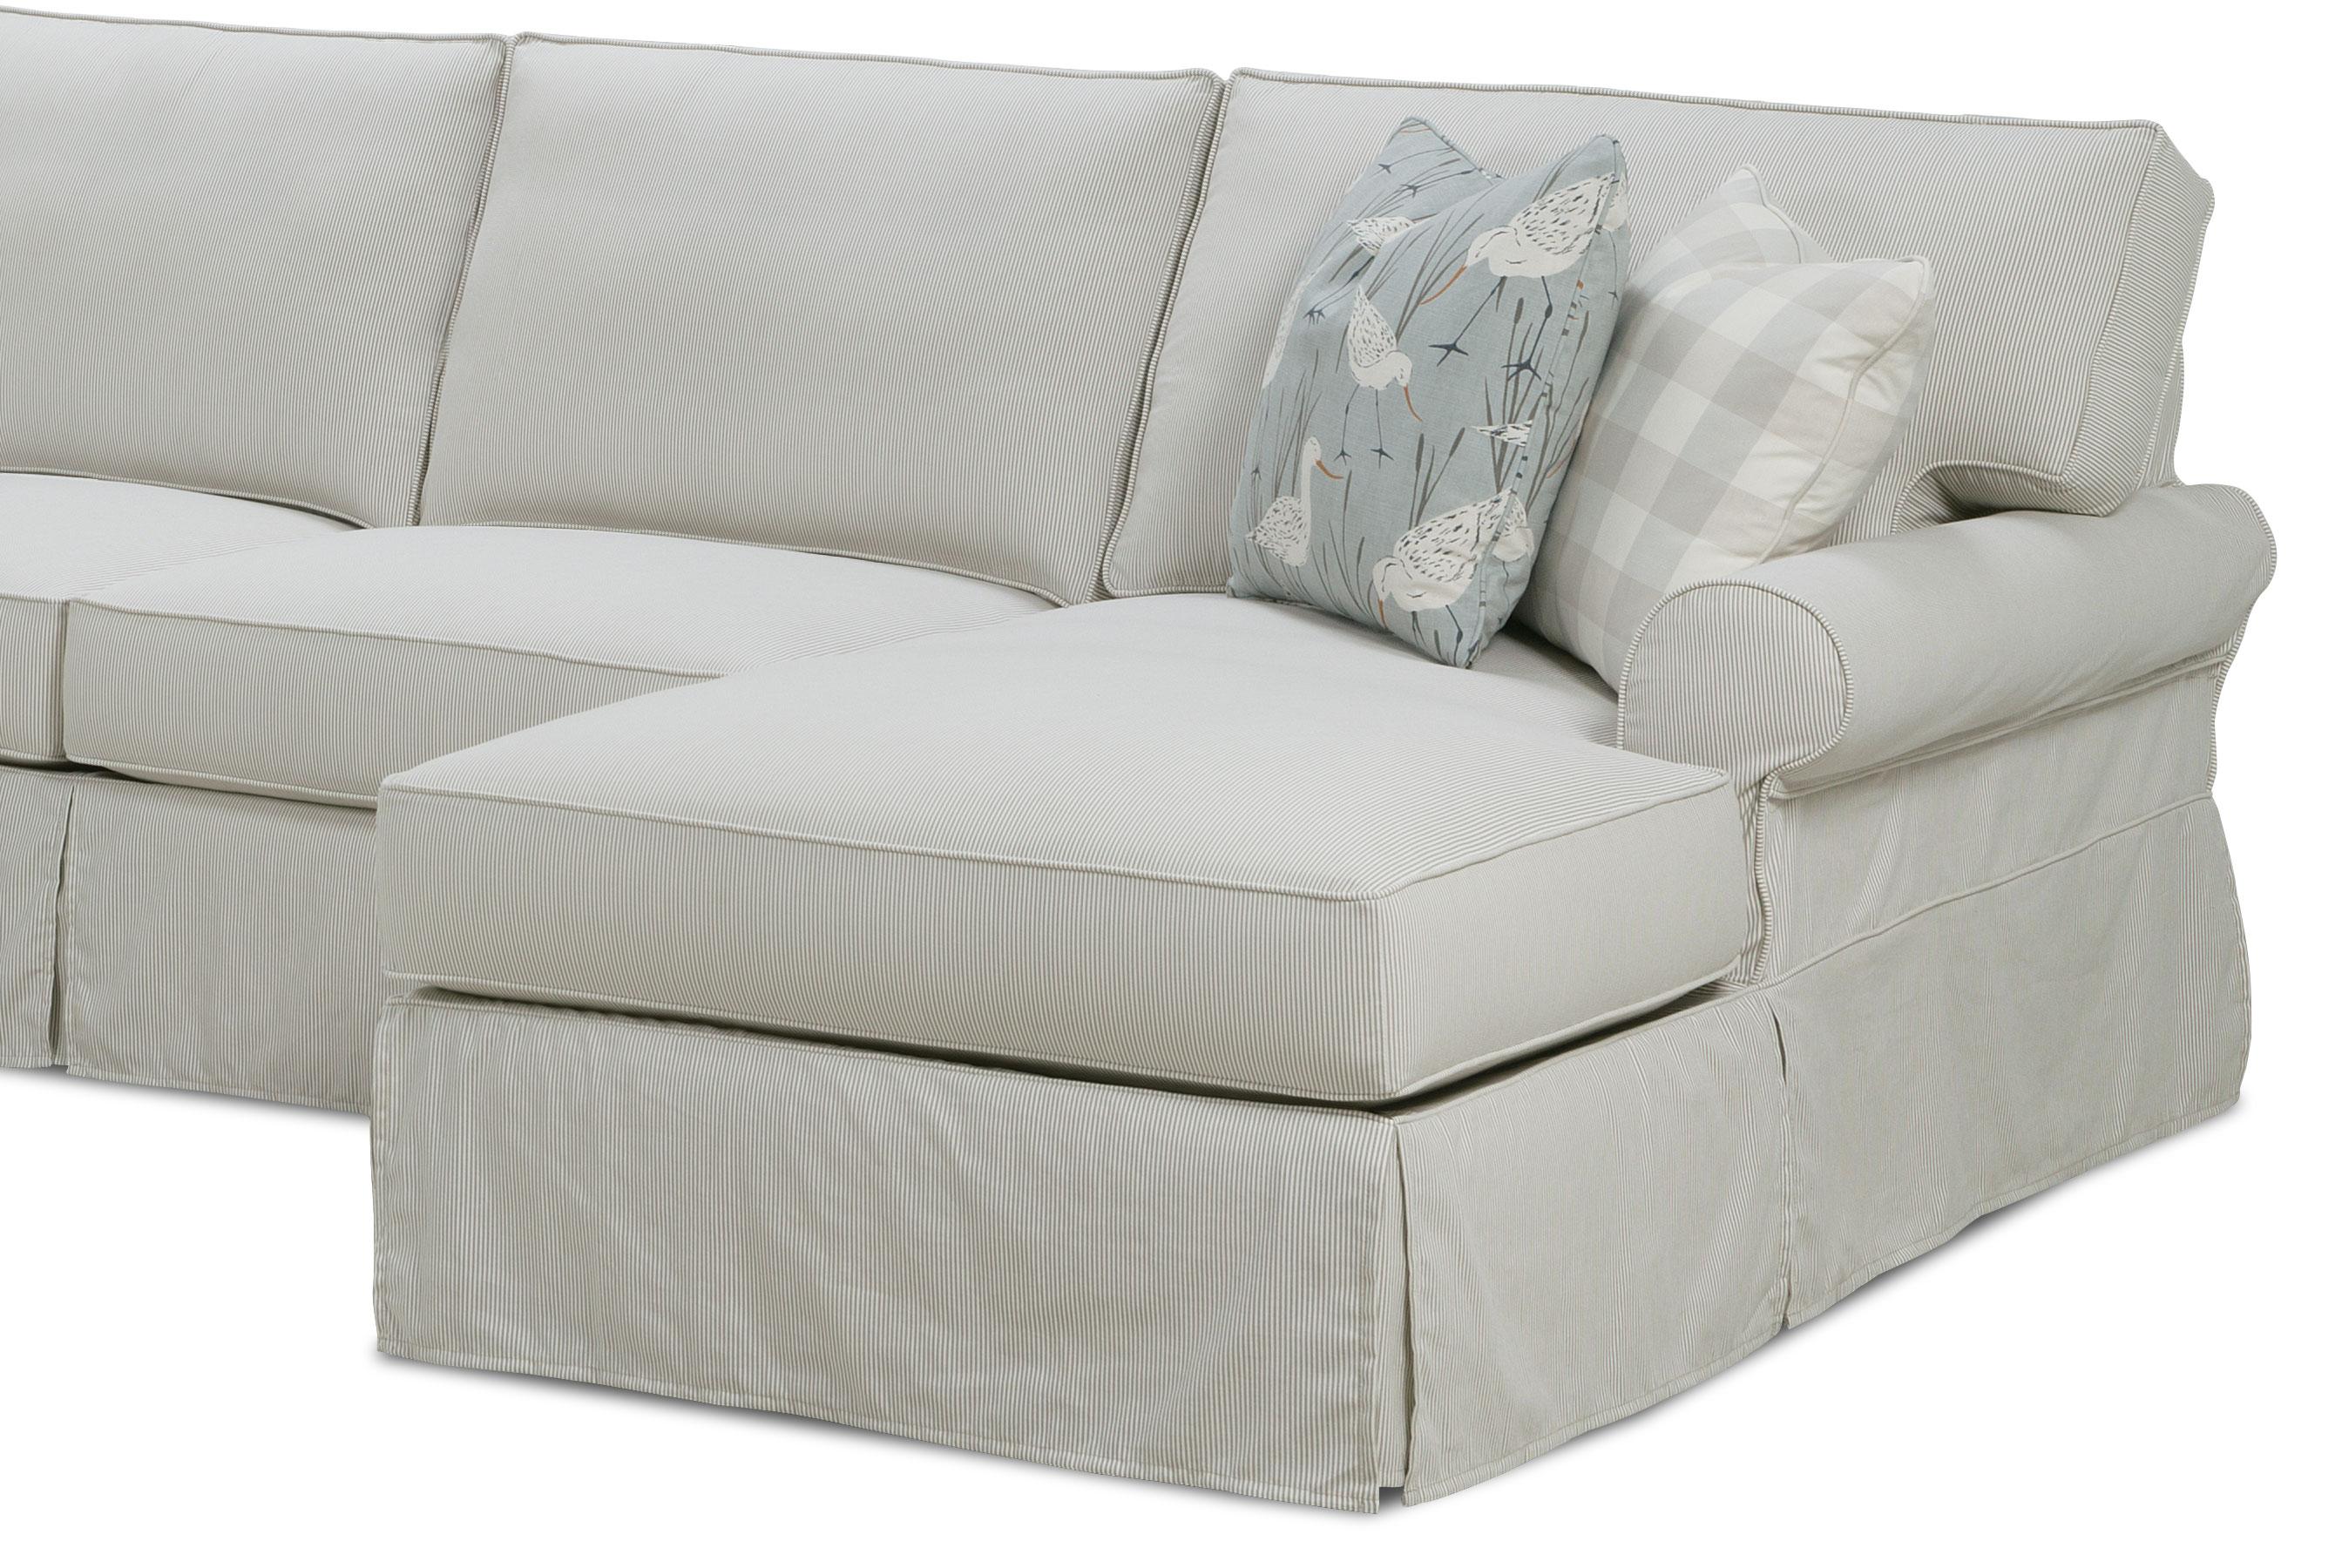 Amazing Easton P275 Slipcover Sectional Sofas And Sectionals Creativecarmelina Interior Chair Design Creativecarmelinacom